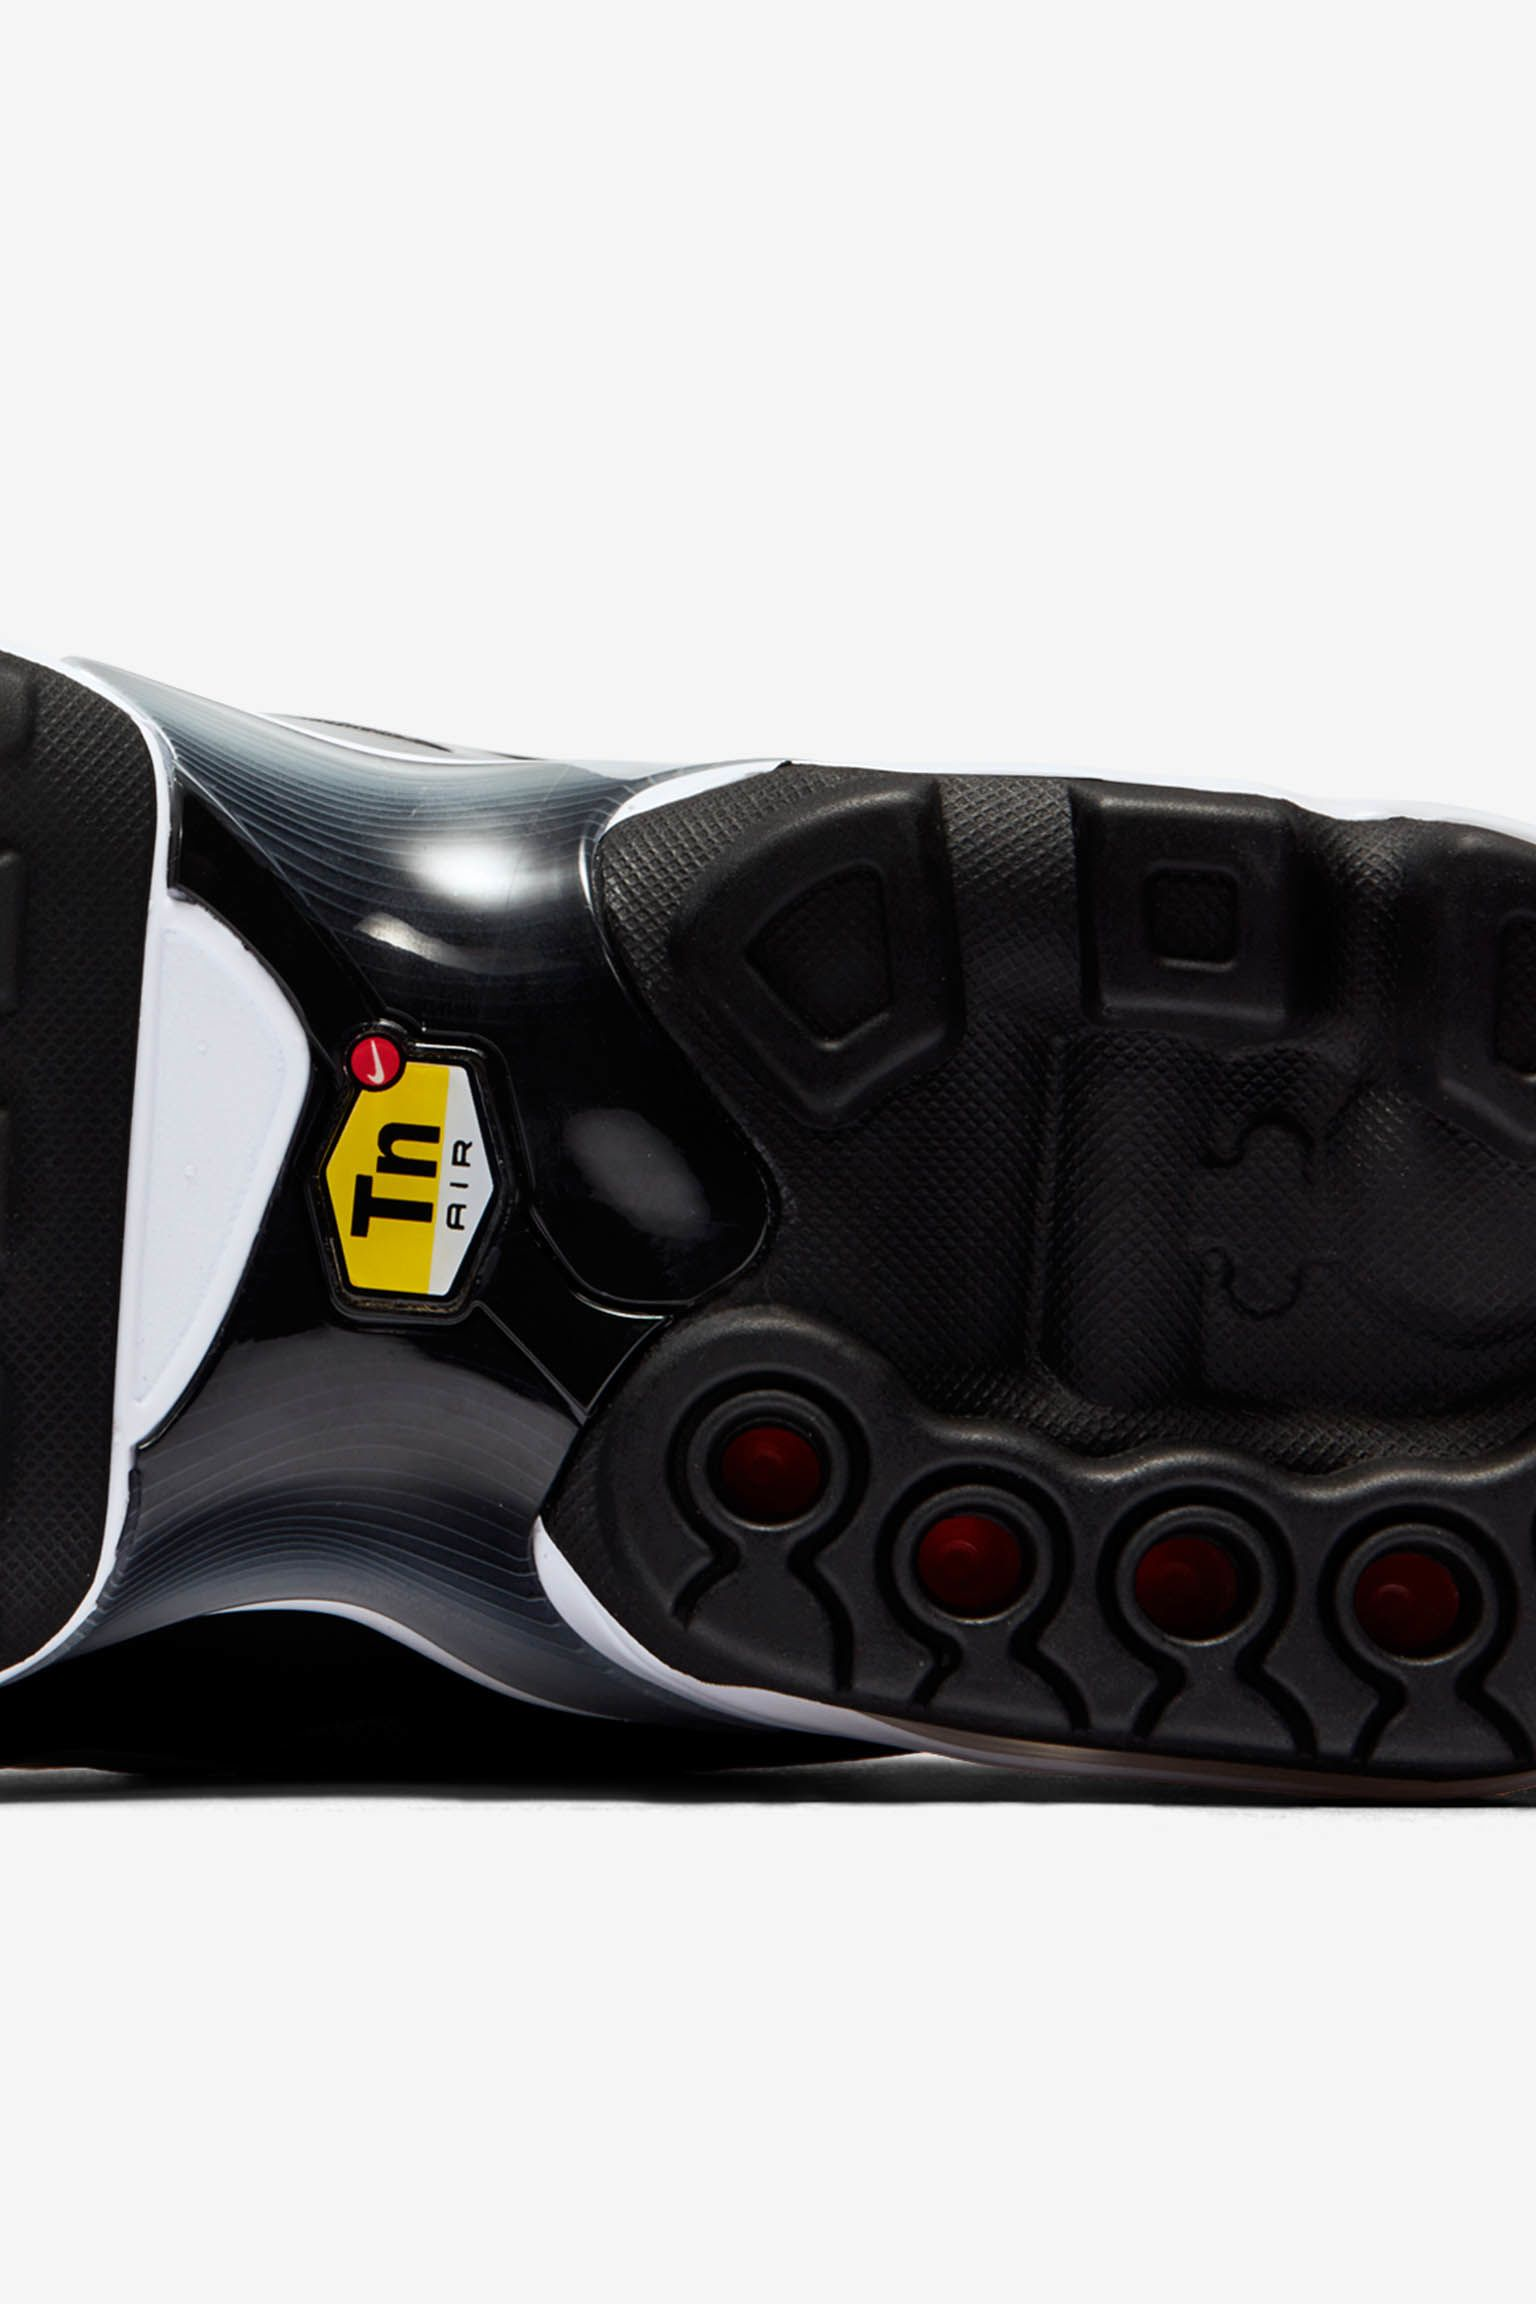 Nike Air Max Plus TN Ultra 'Black & Wolf Grey' Release Date ...